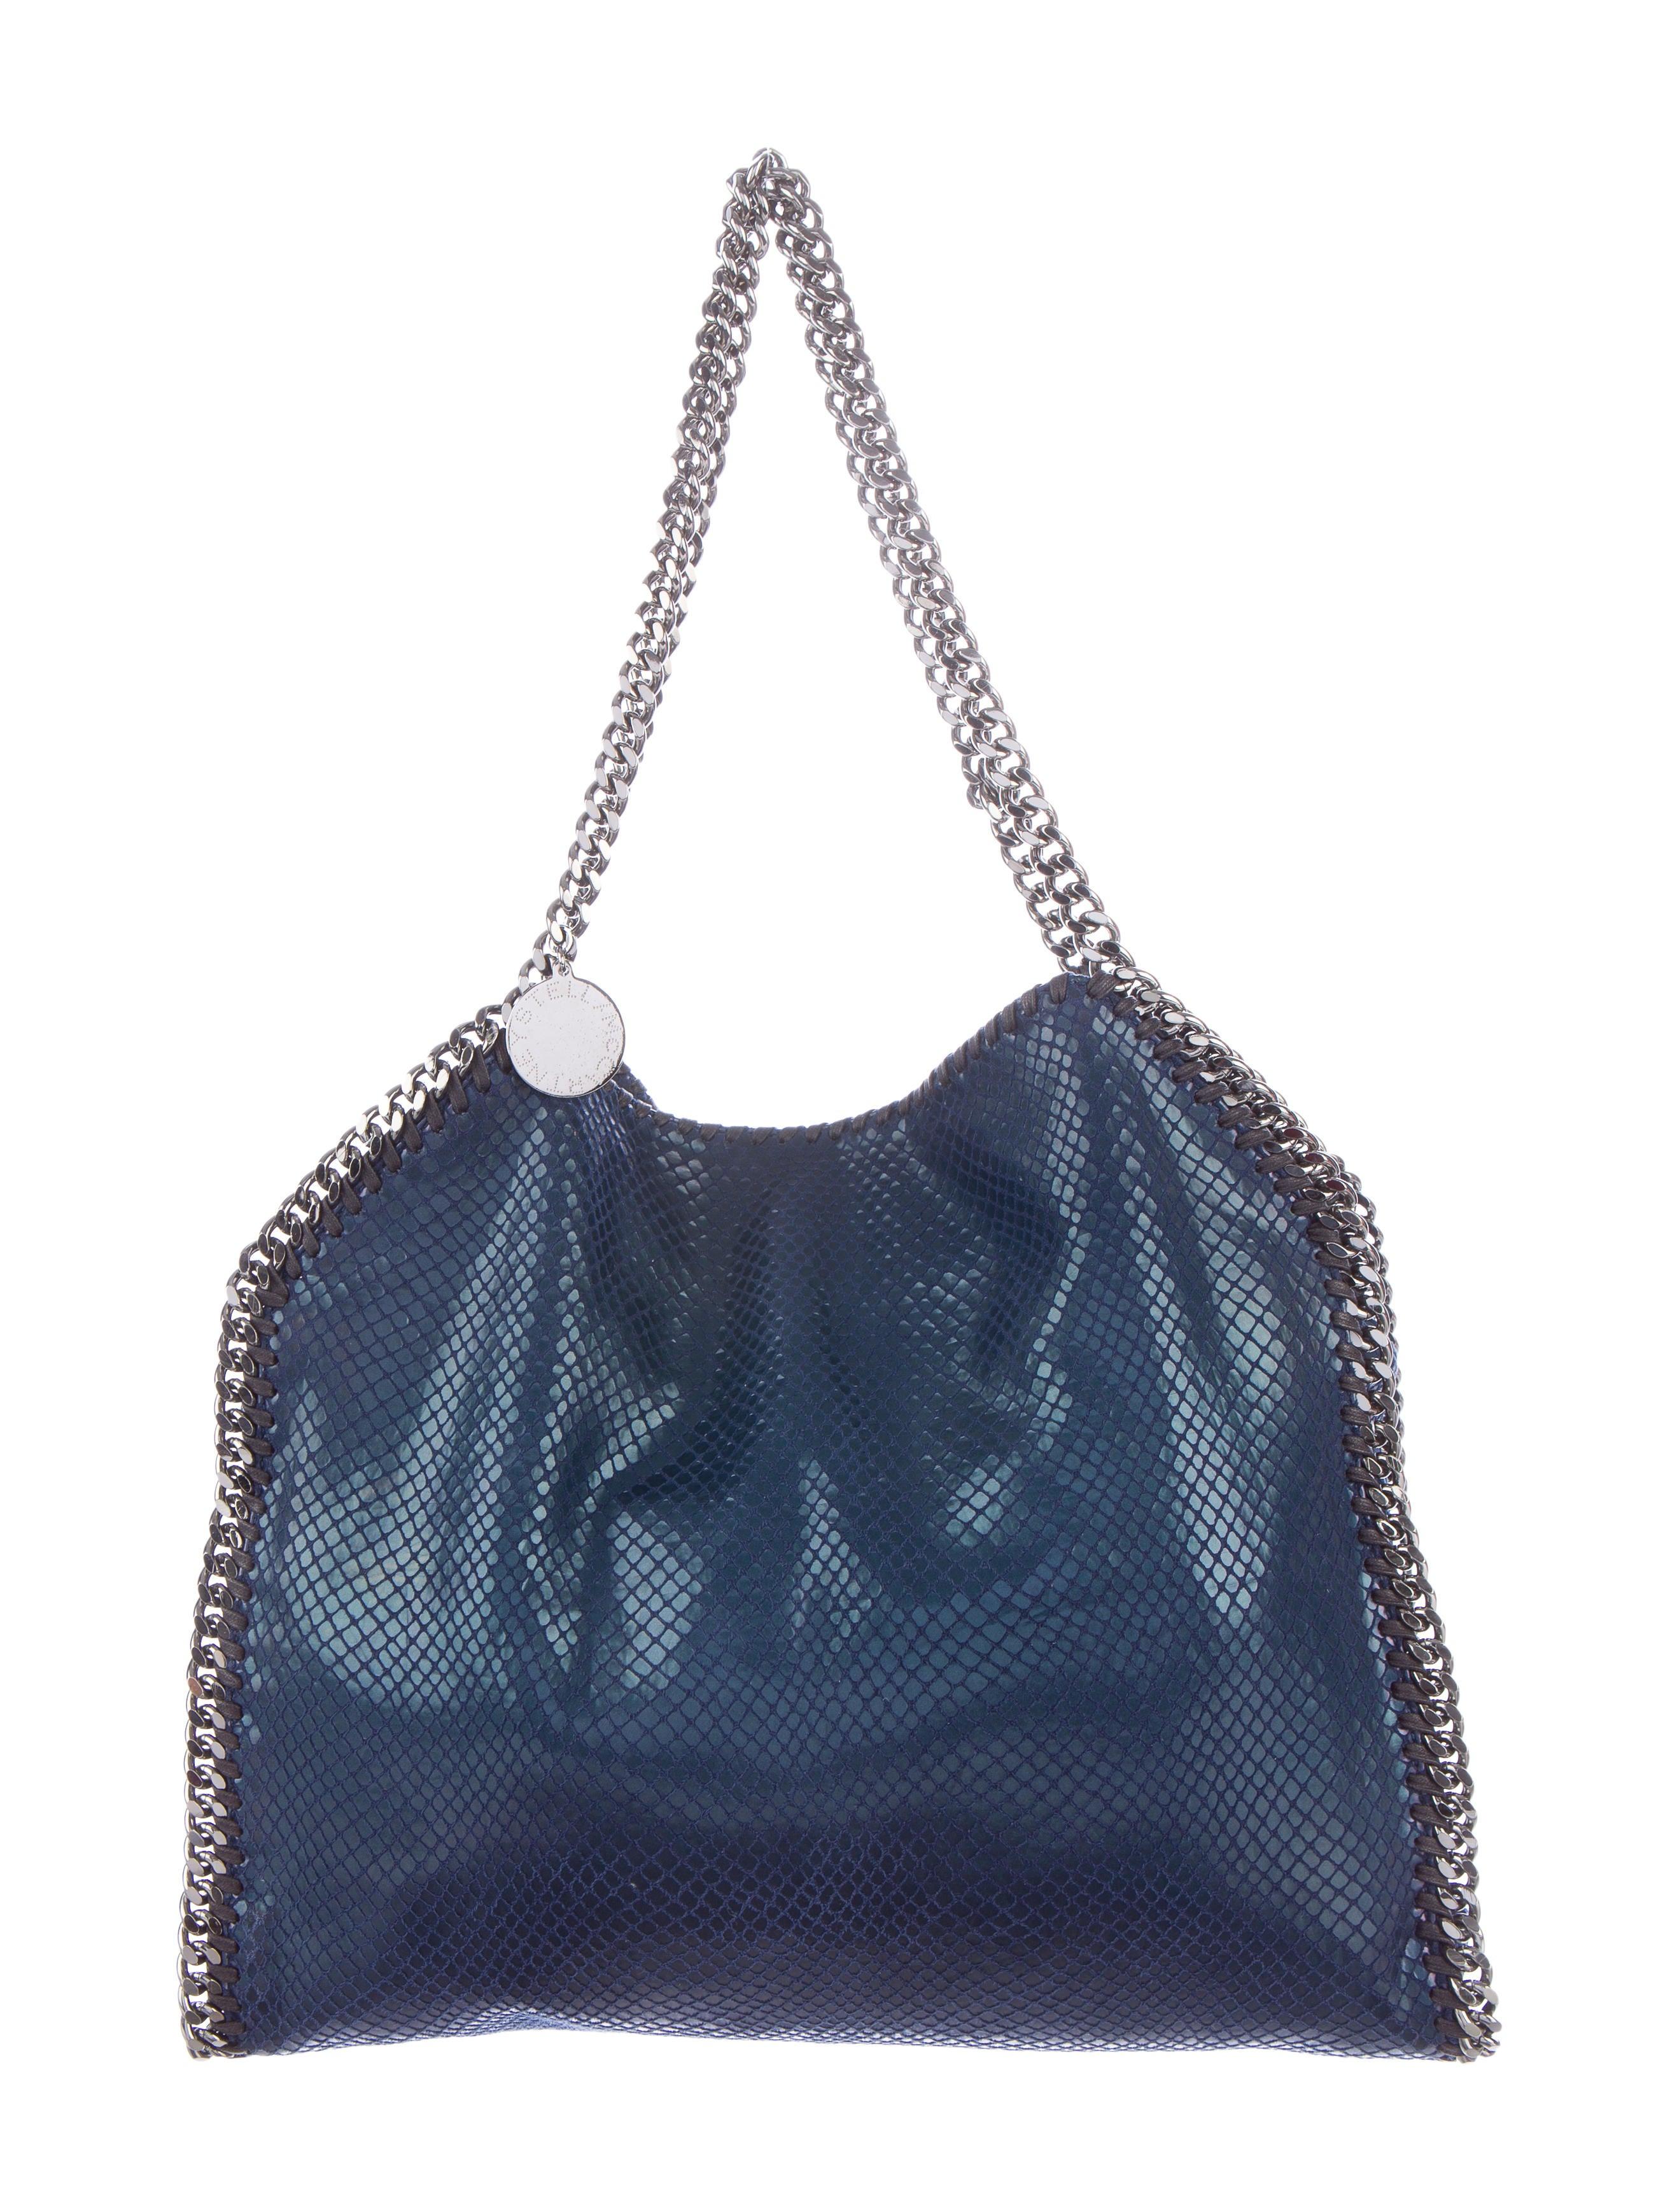 stella mccartney embossed falabella bag handbags stl39669 the realreal. Black Bedroom Furniture Sets. Home Design Ideas